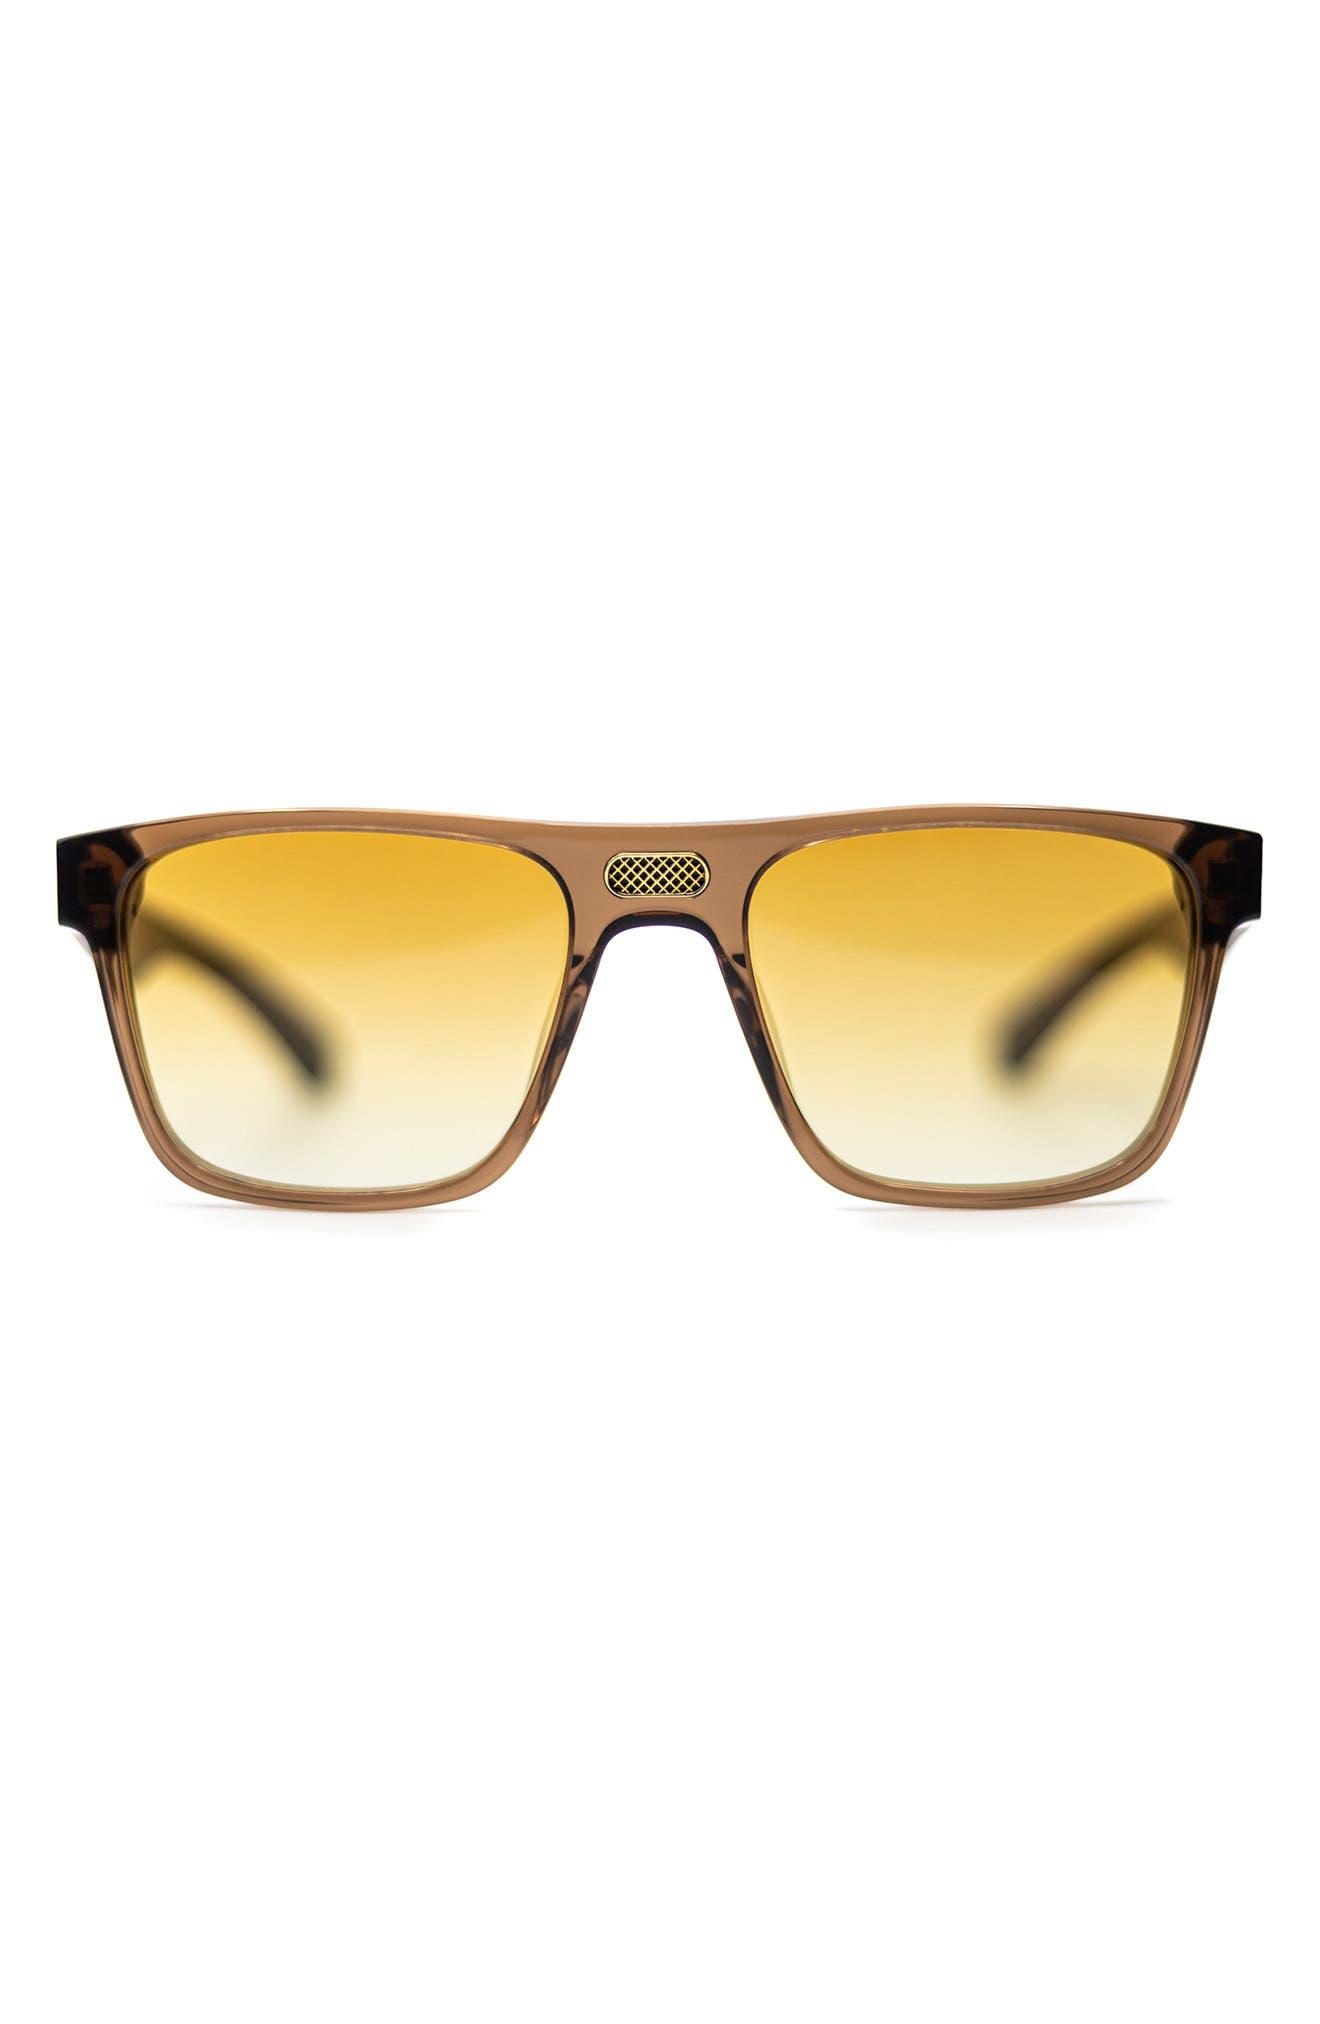 Legend 54mm Gradient Rectangular Blue Light Blocking Sunglasses